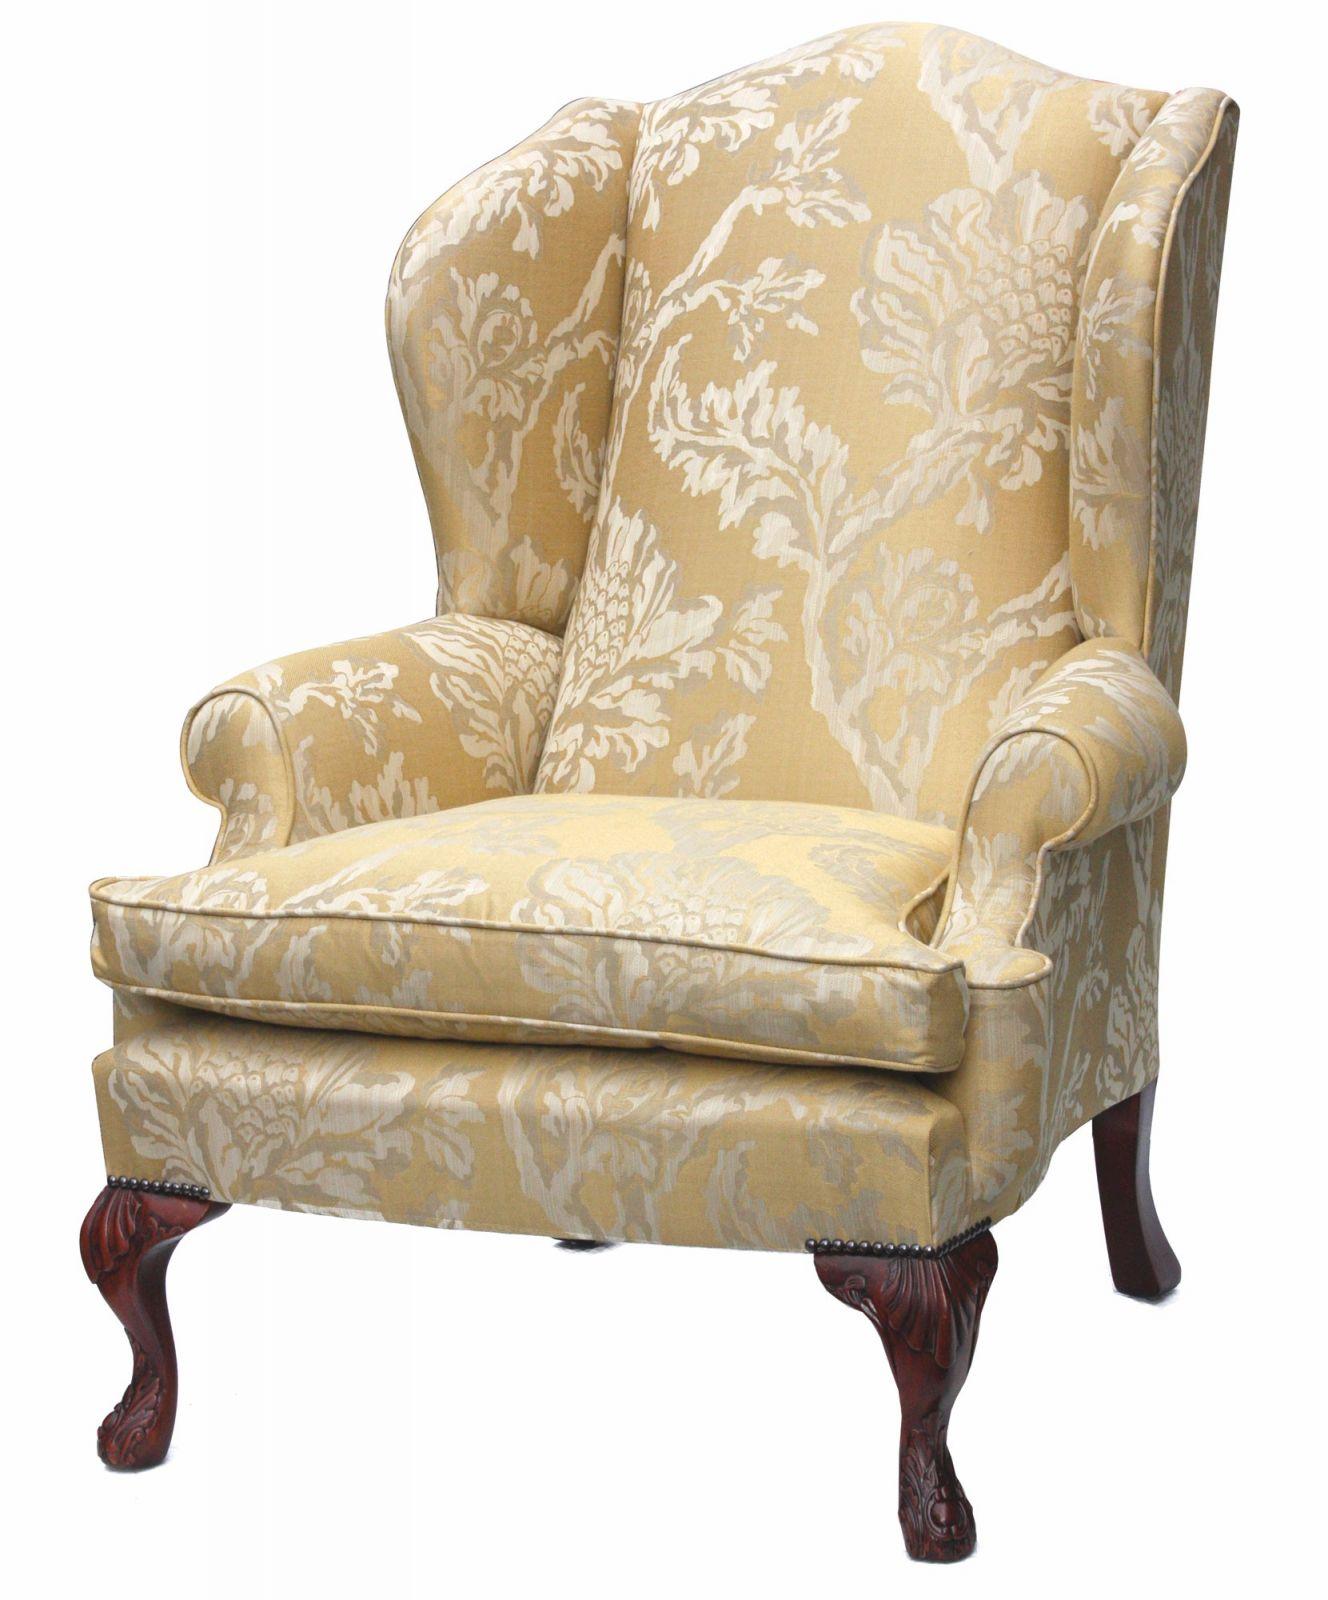 Hambledon wing chair